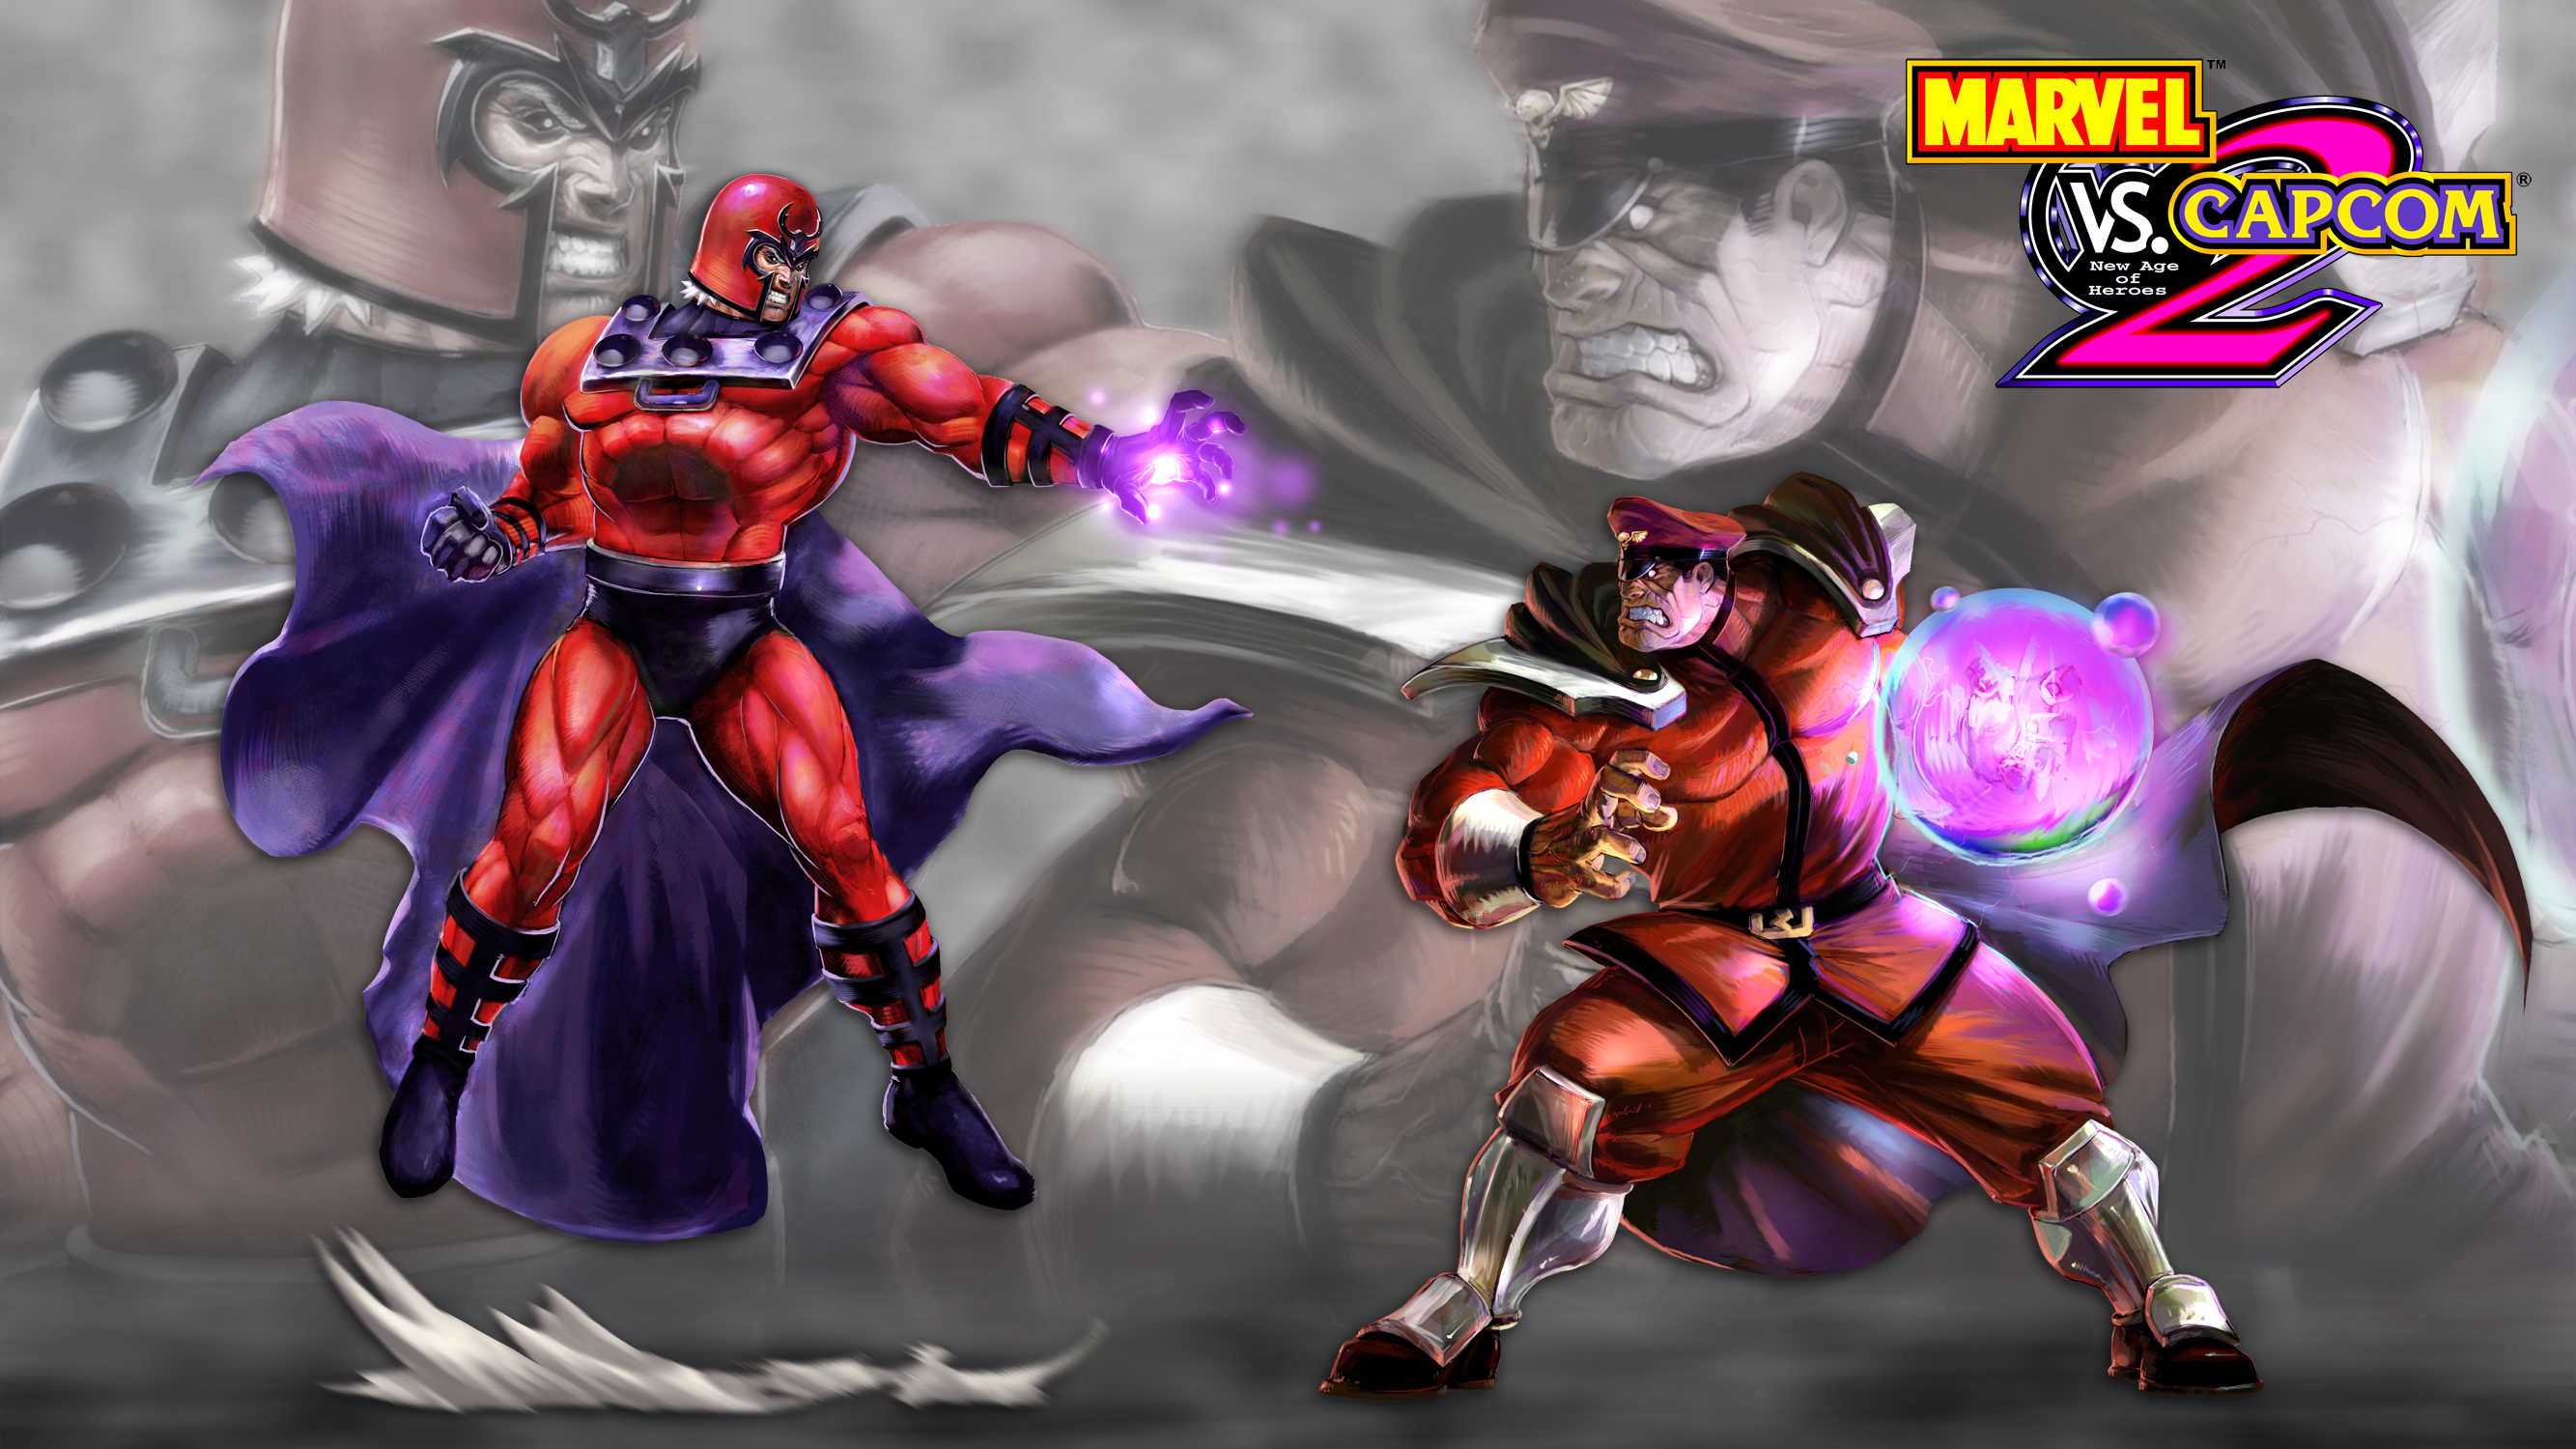 Spider Man 3d Live Wallpaper Pc Marvel Vs Capcom 2 Magneto Vs Bison El Mundo Tech